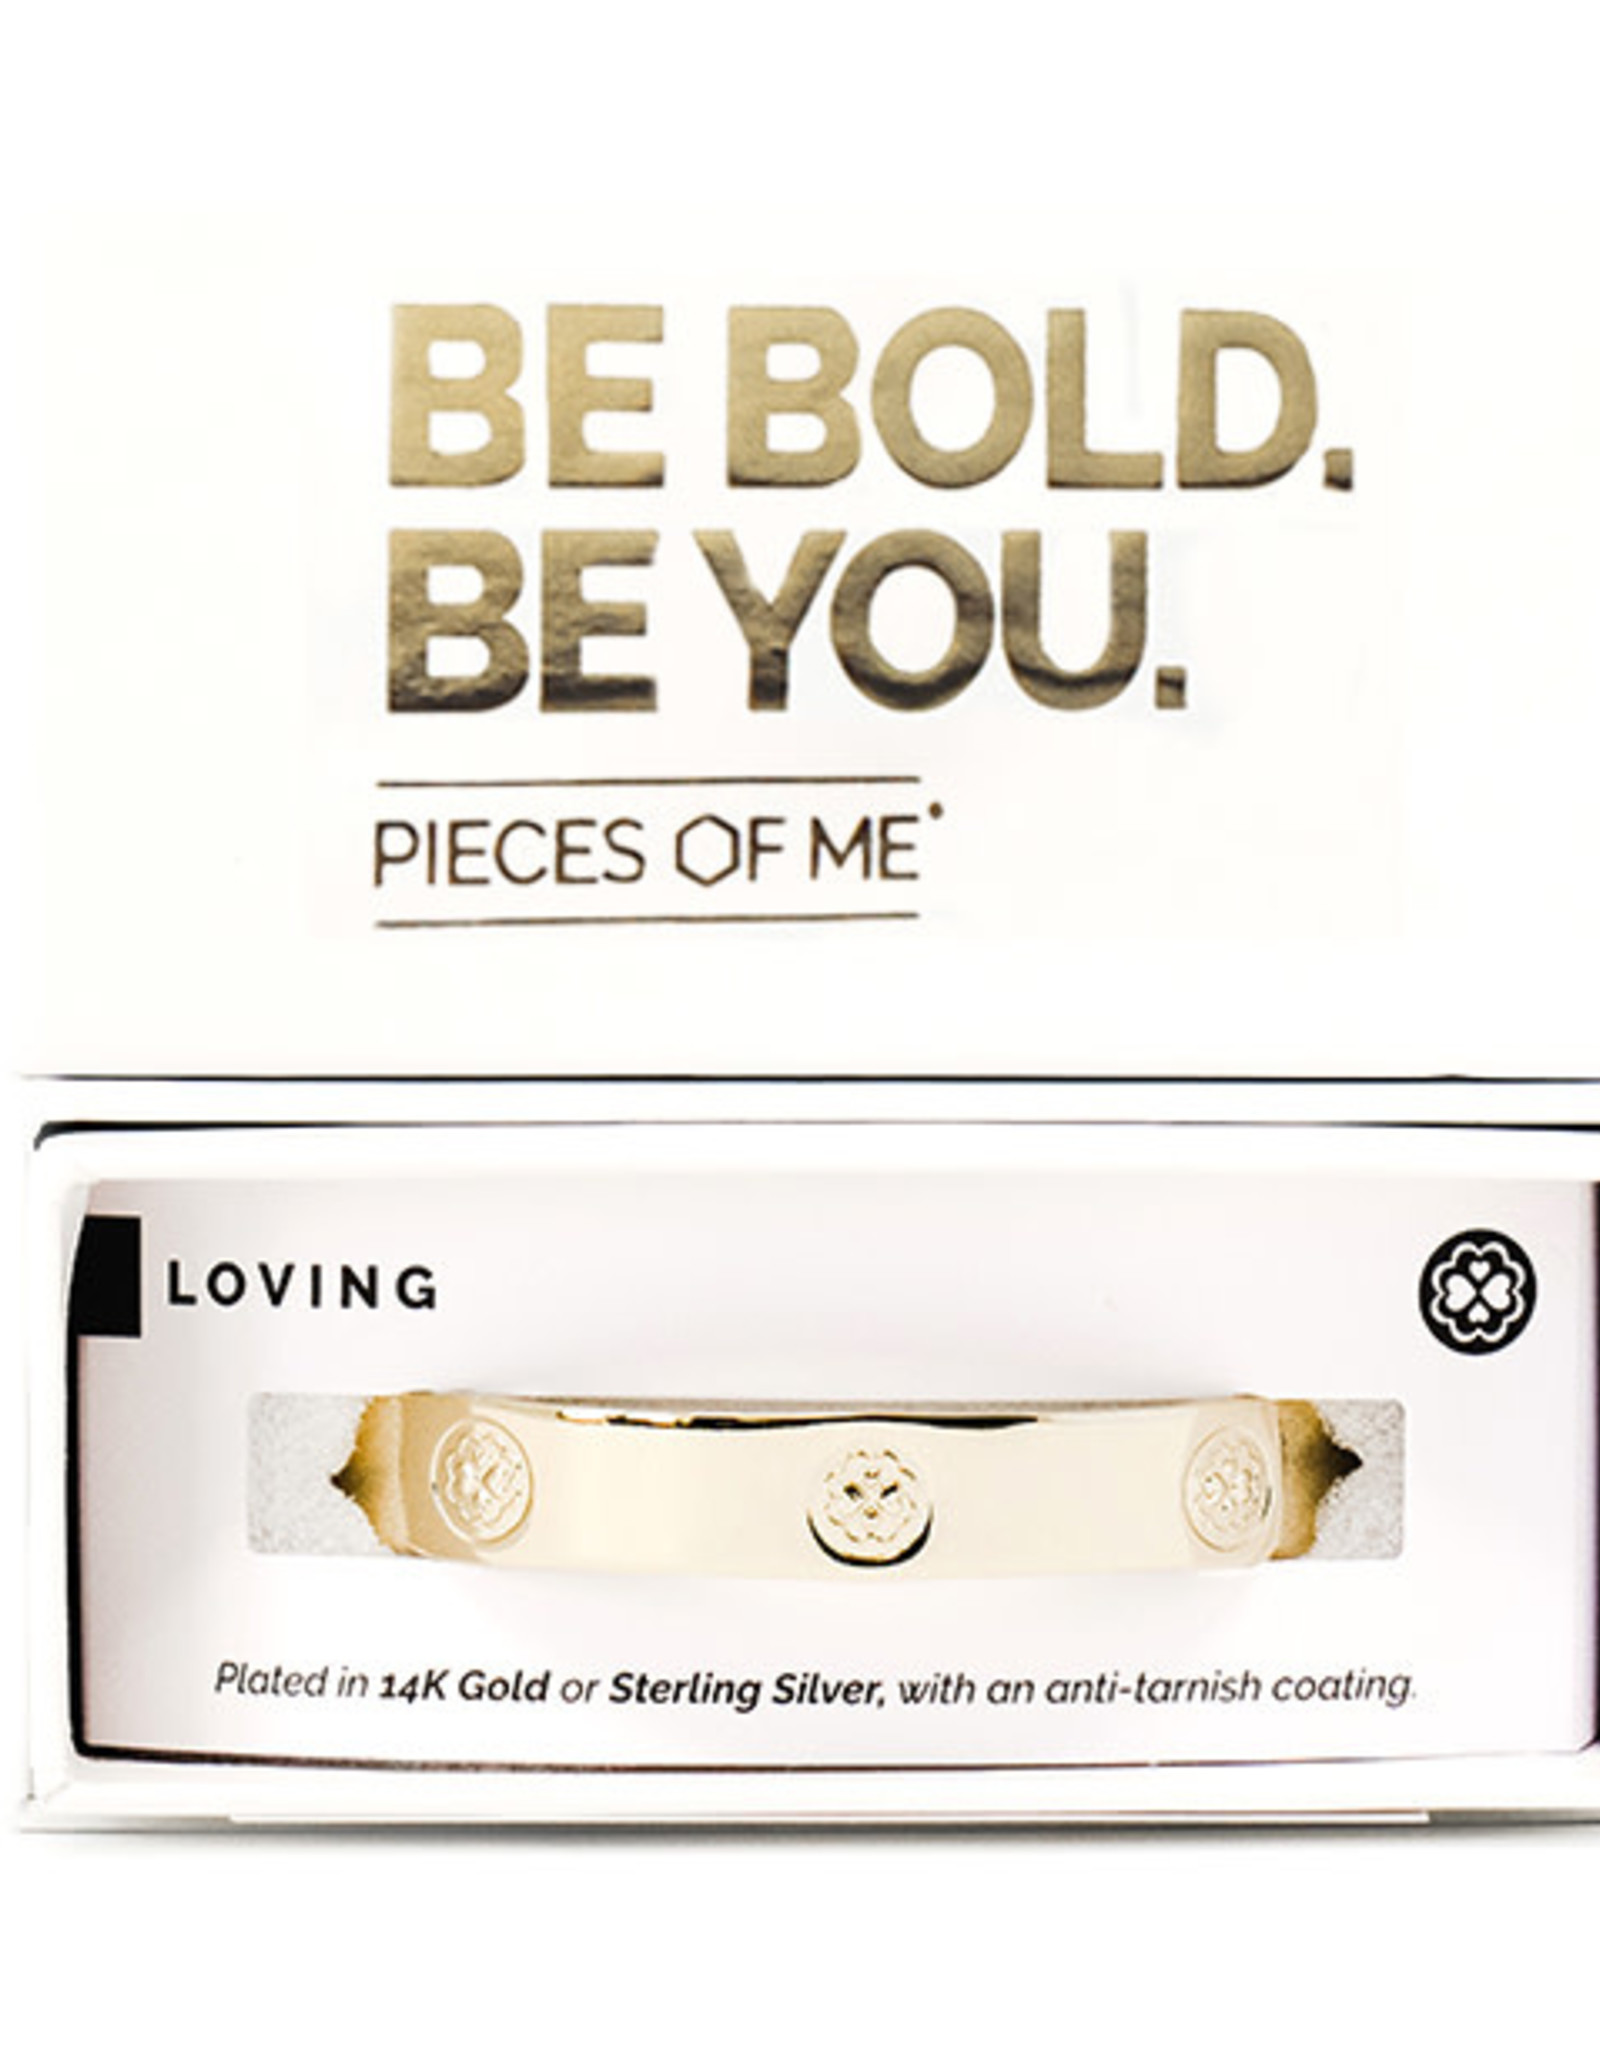 Pieces of Me Bracelet Loving Gold